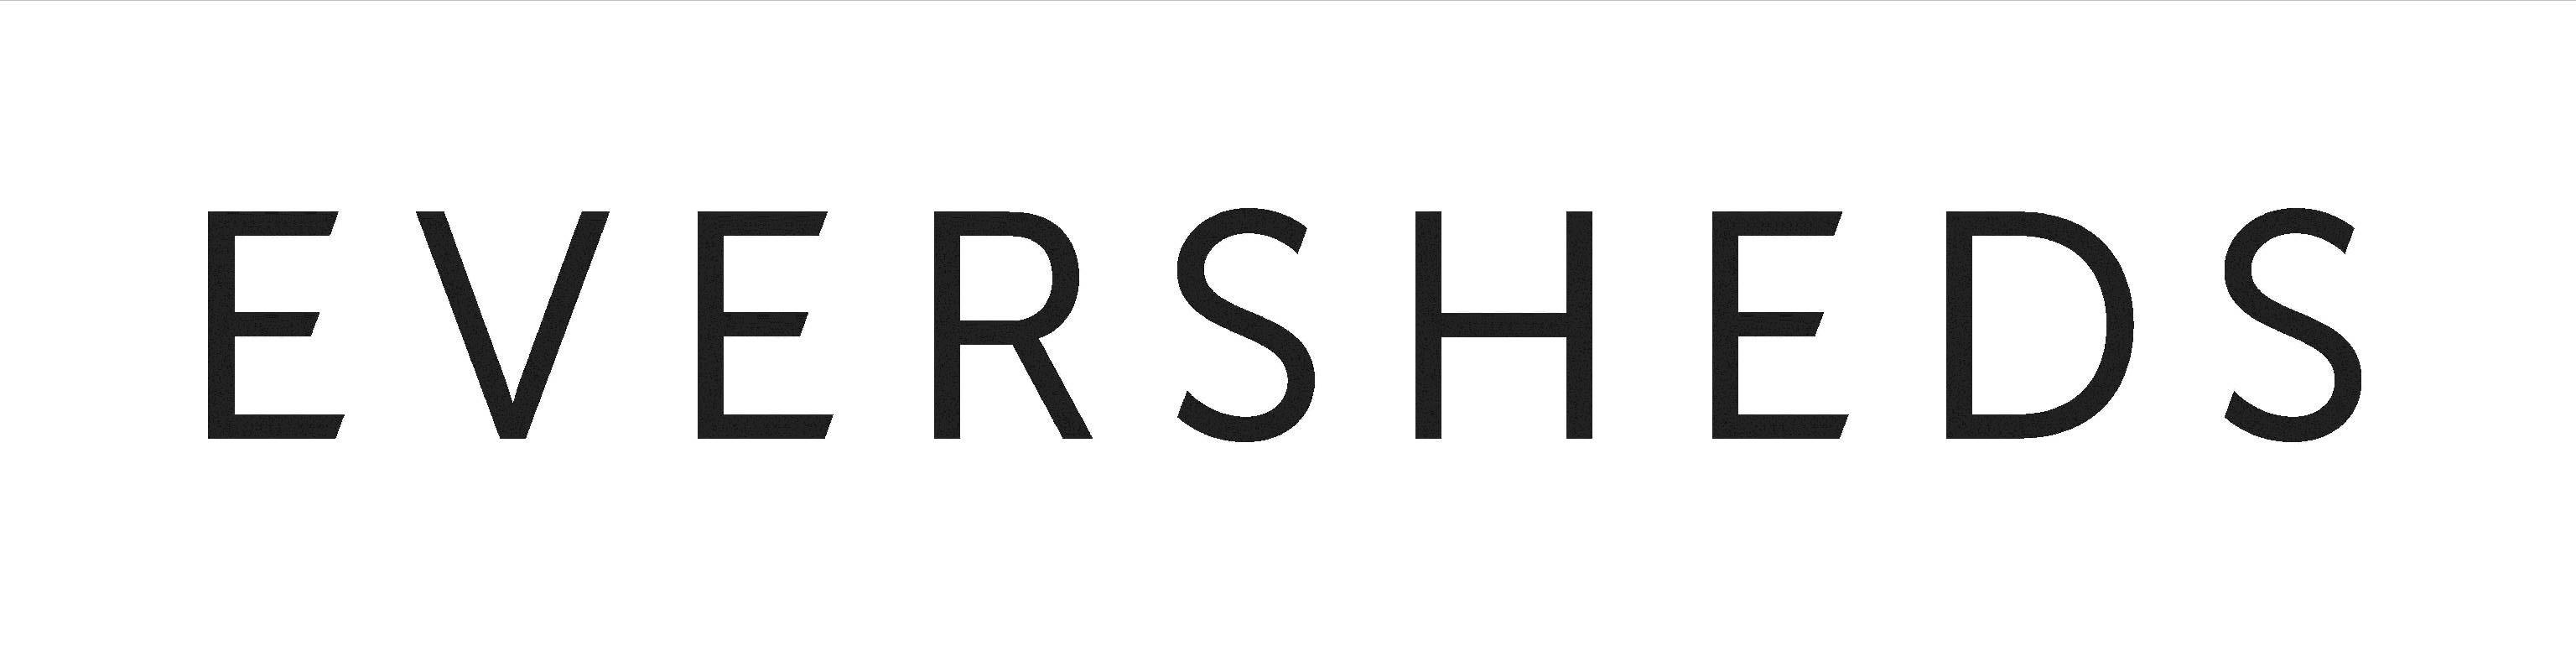 eversheds-logo